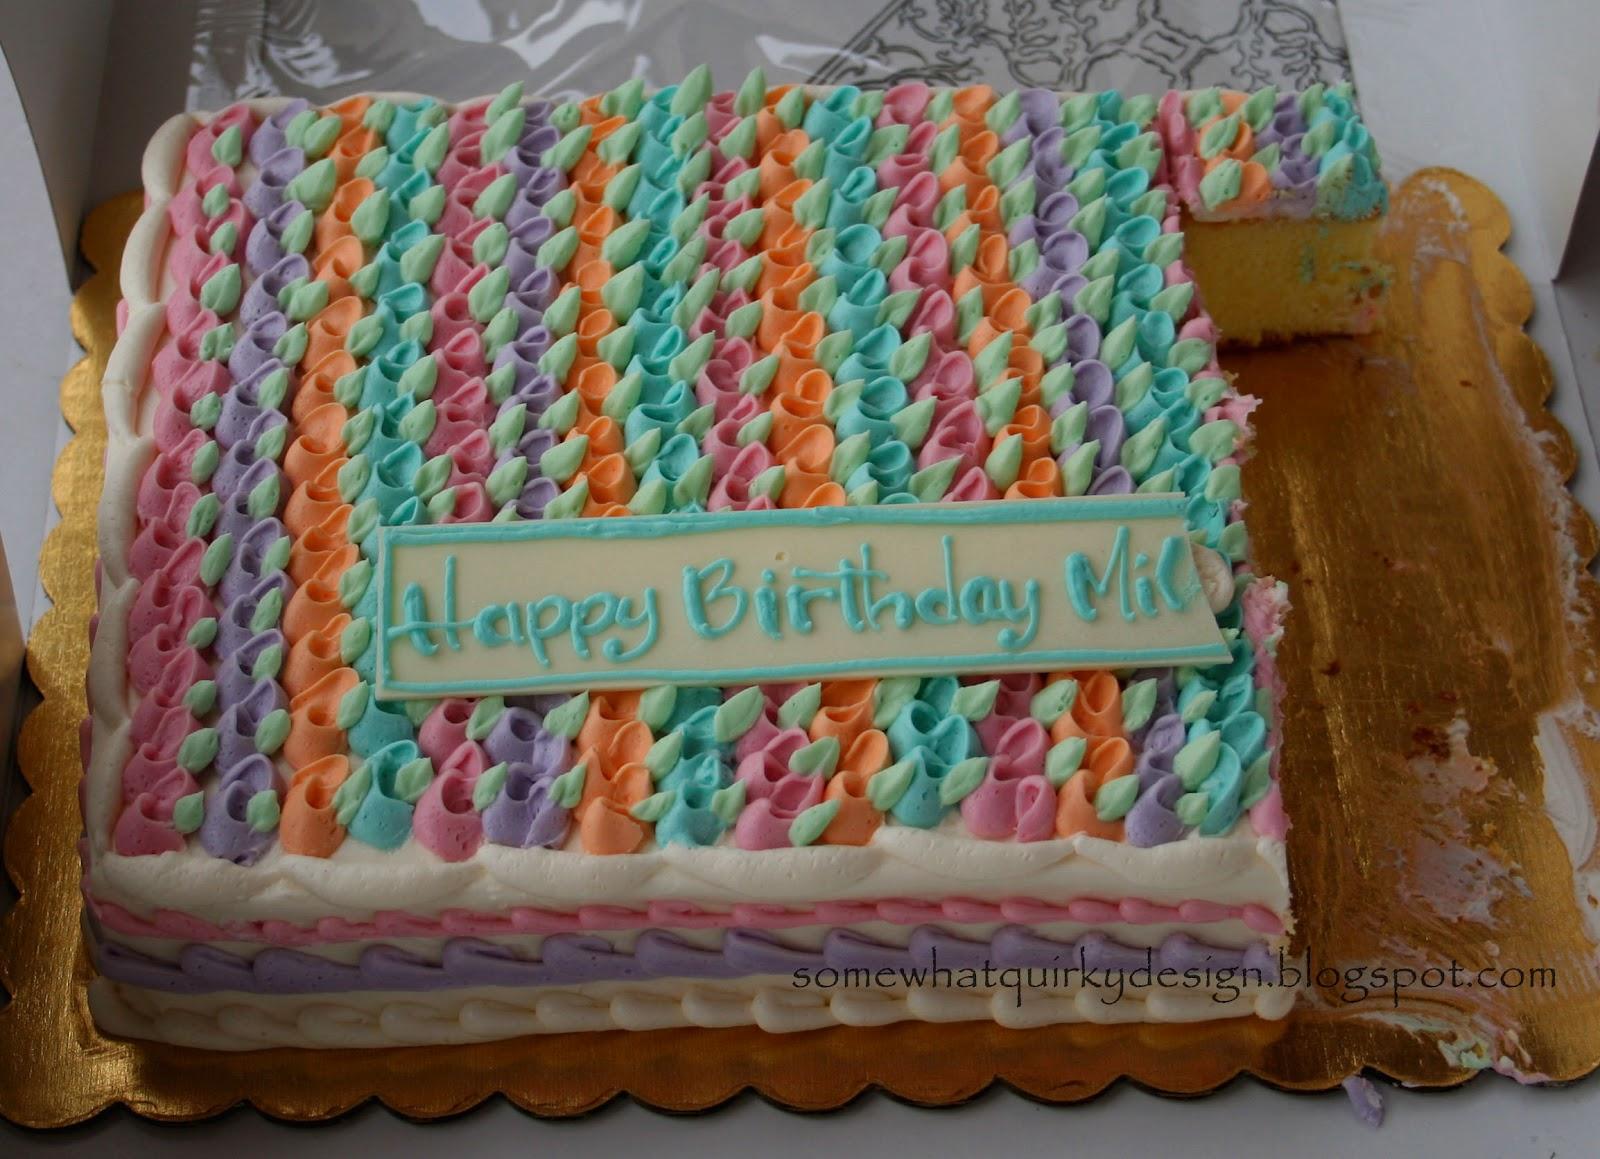 Cake Mix Slang Meaning